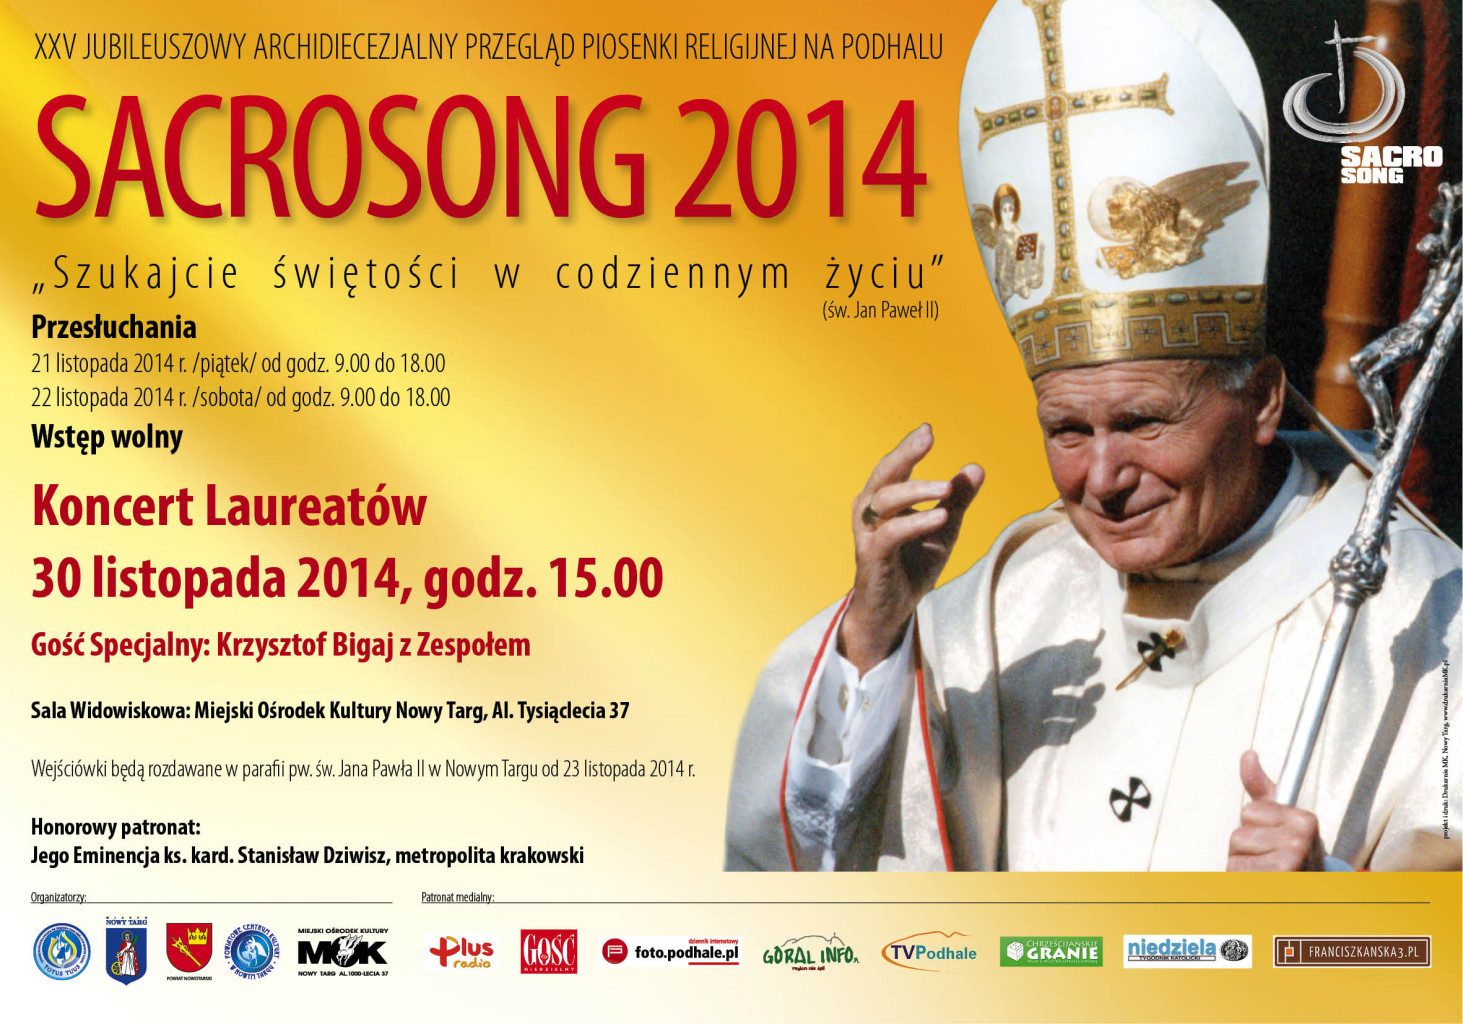 Sacrosong 2014 - Nowy Targ